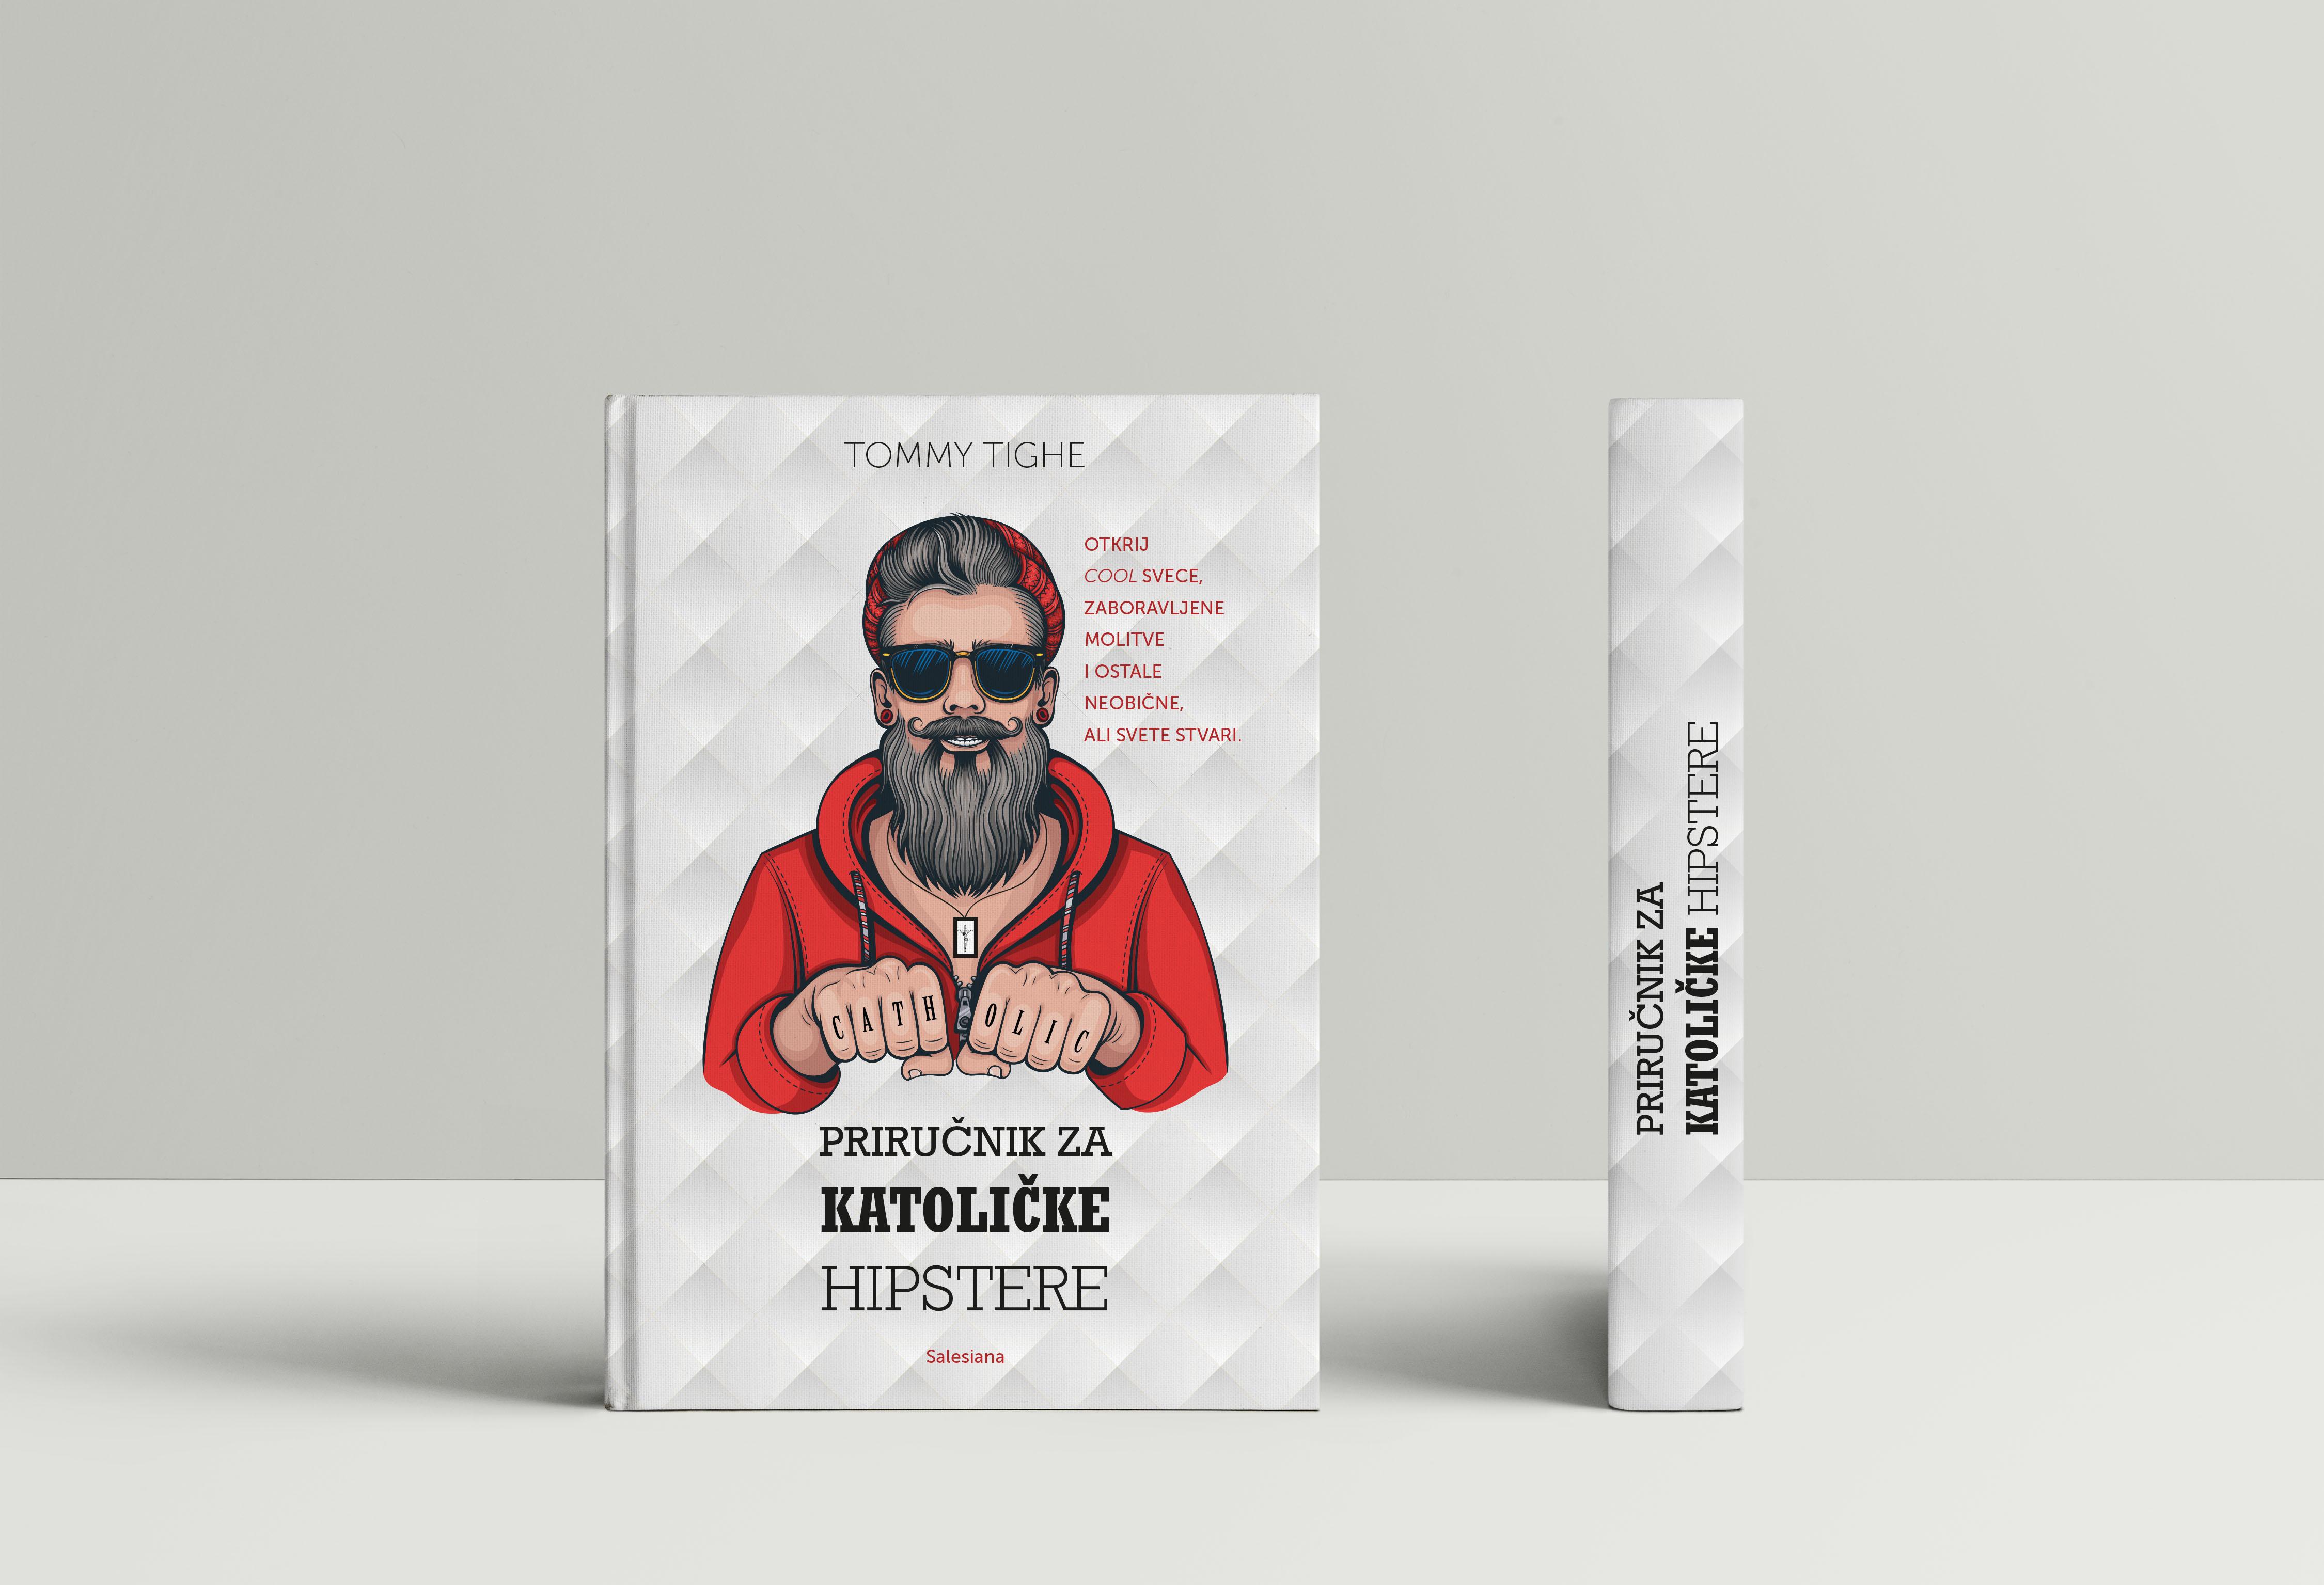 Priručnik za katoličke hipstere